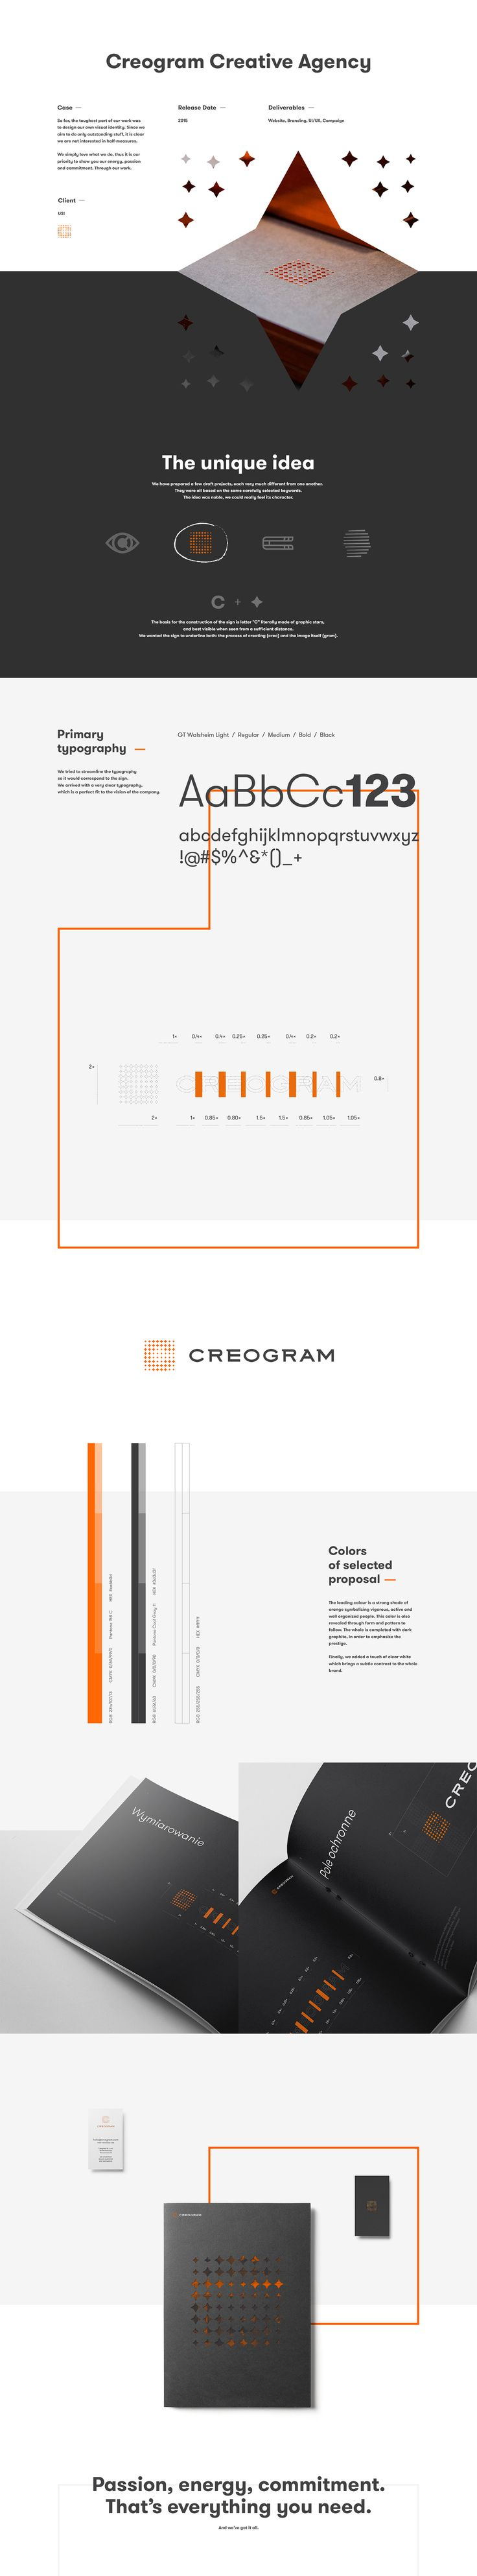 Creogram on Behance